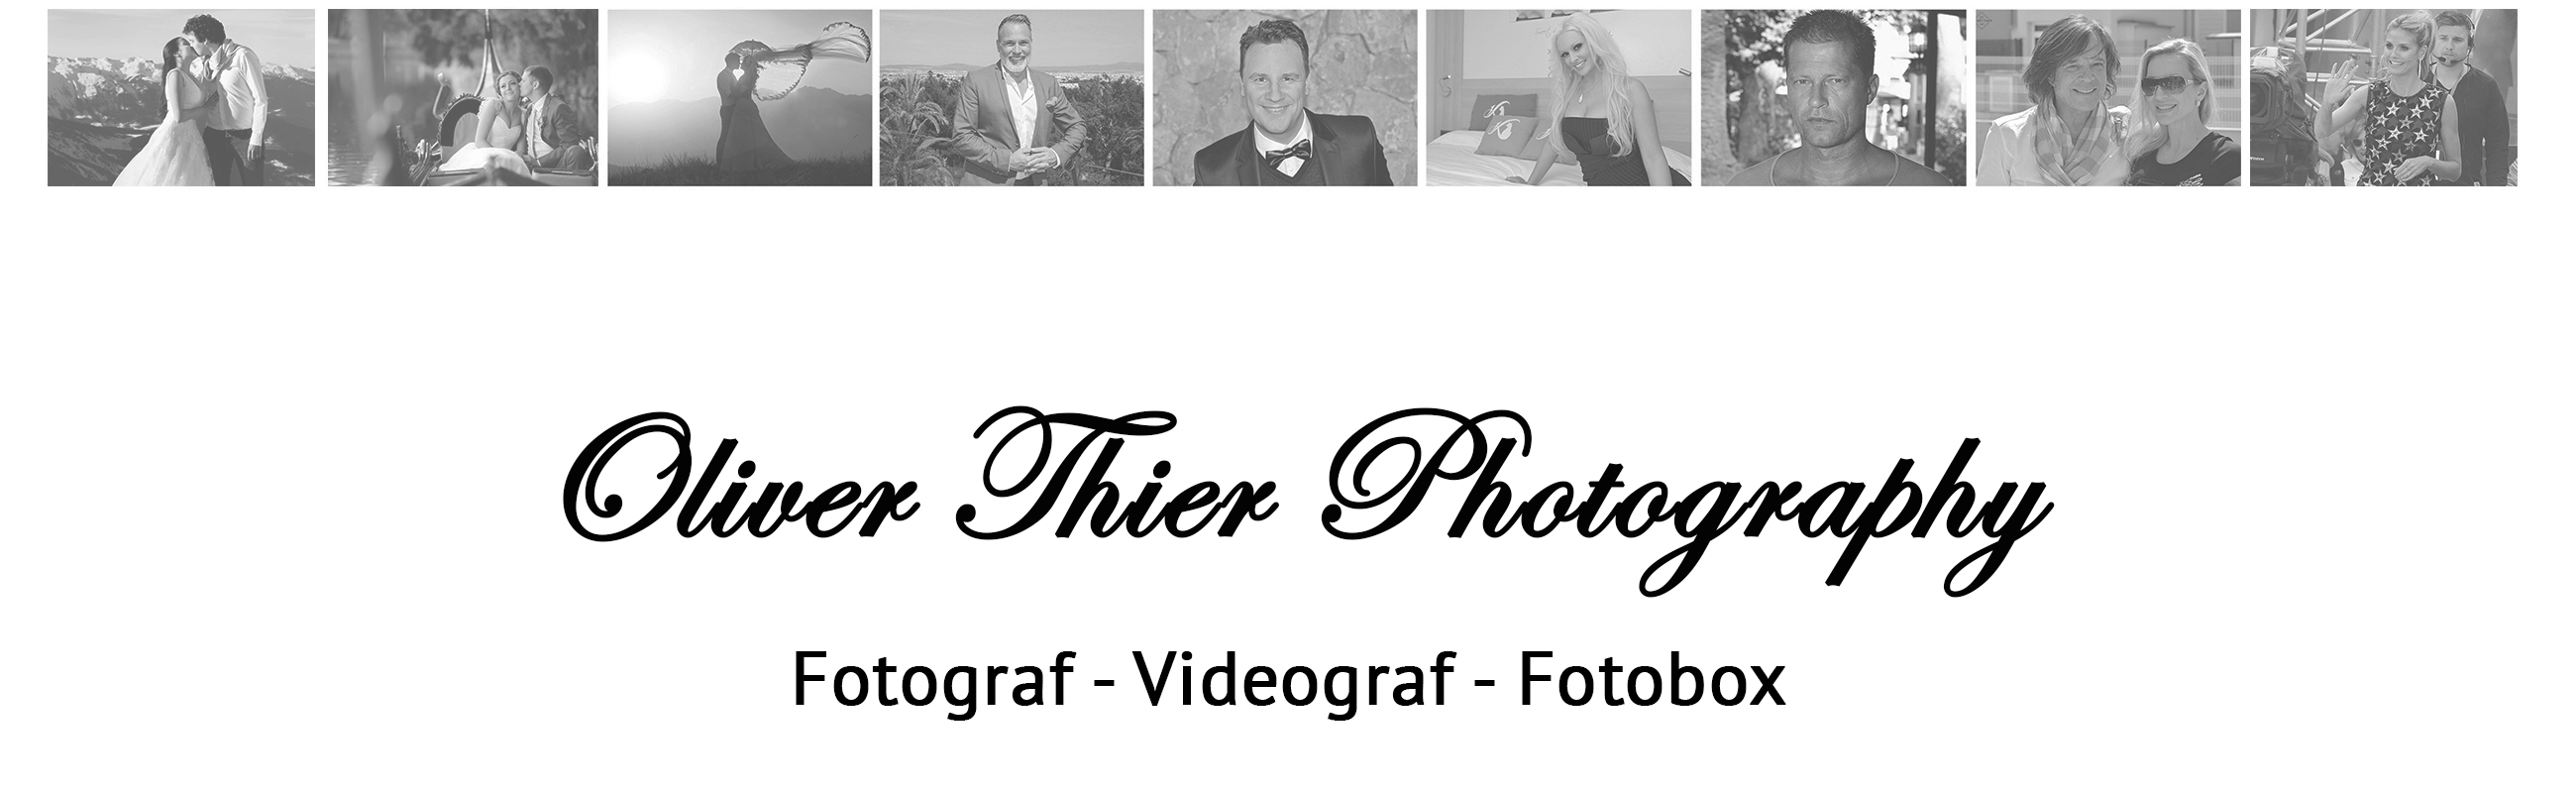 FOTOGRAF VENEDIG BOZEN MERAN BRIXEN SÜDTIROL SEXTEN GARDASEE HOCHZEITSFOTOGRAF